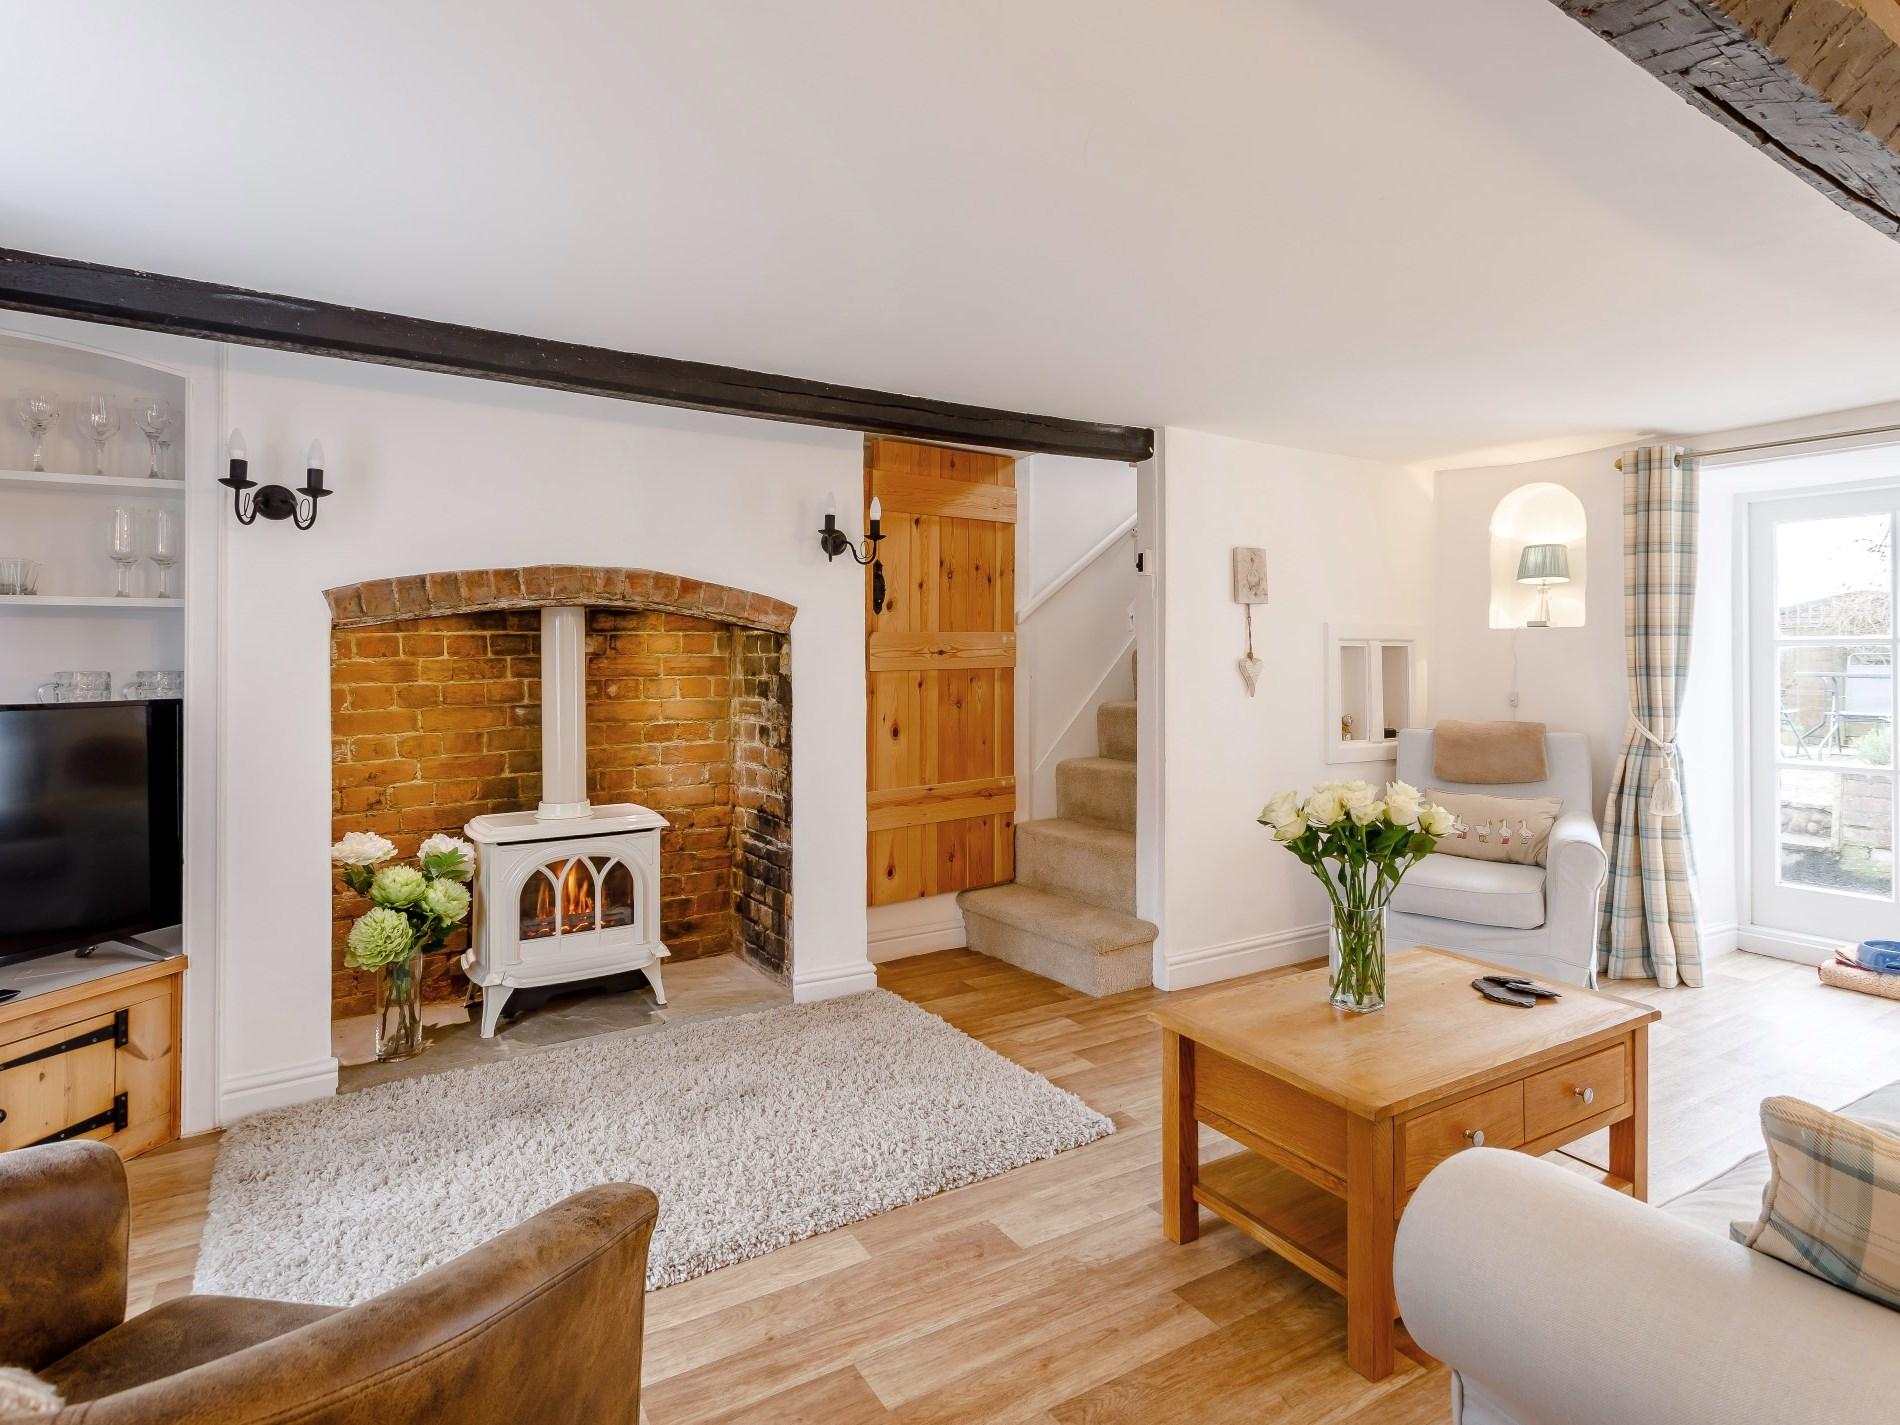 2 Bedroom Cottage in Sidmouth, Devon